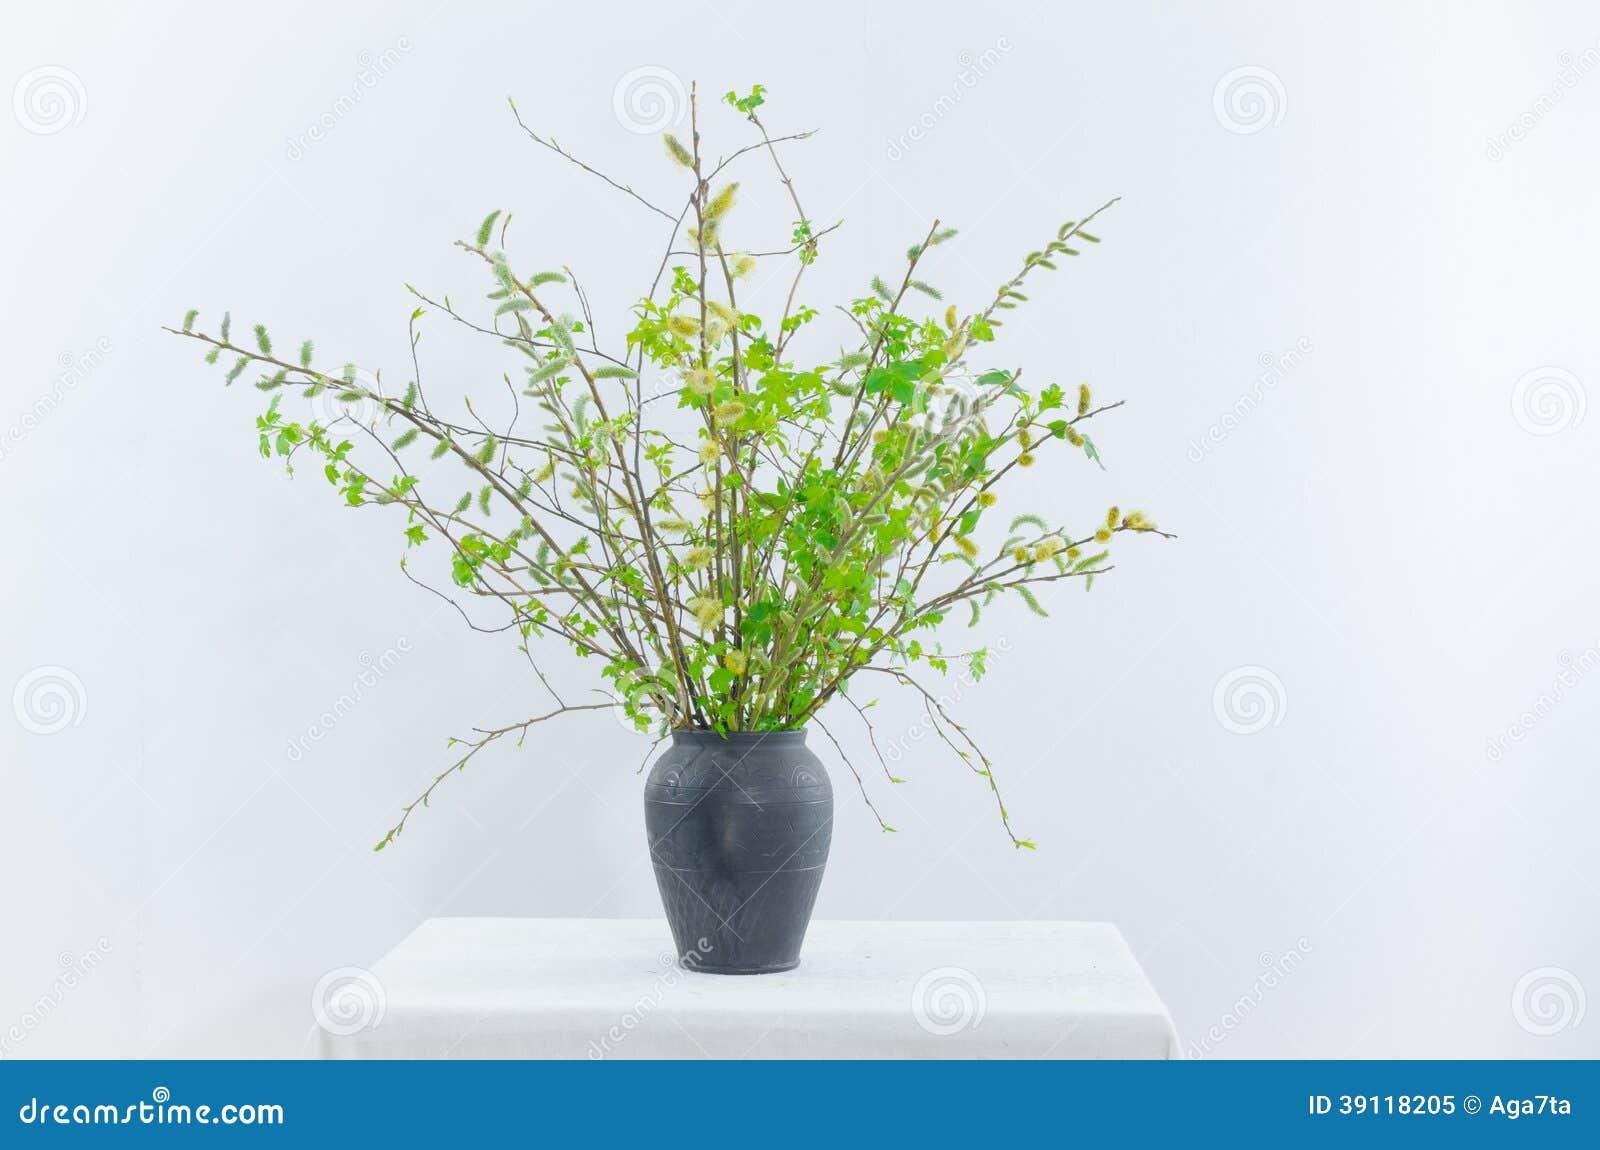 De lenteboeket met groene takjes